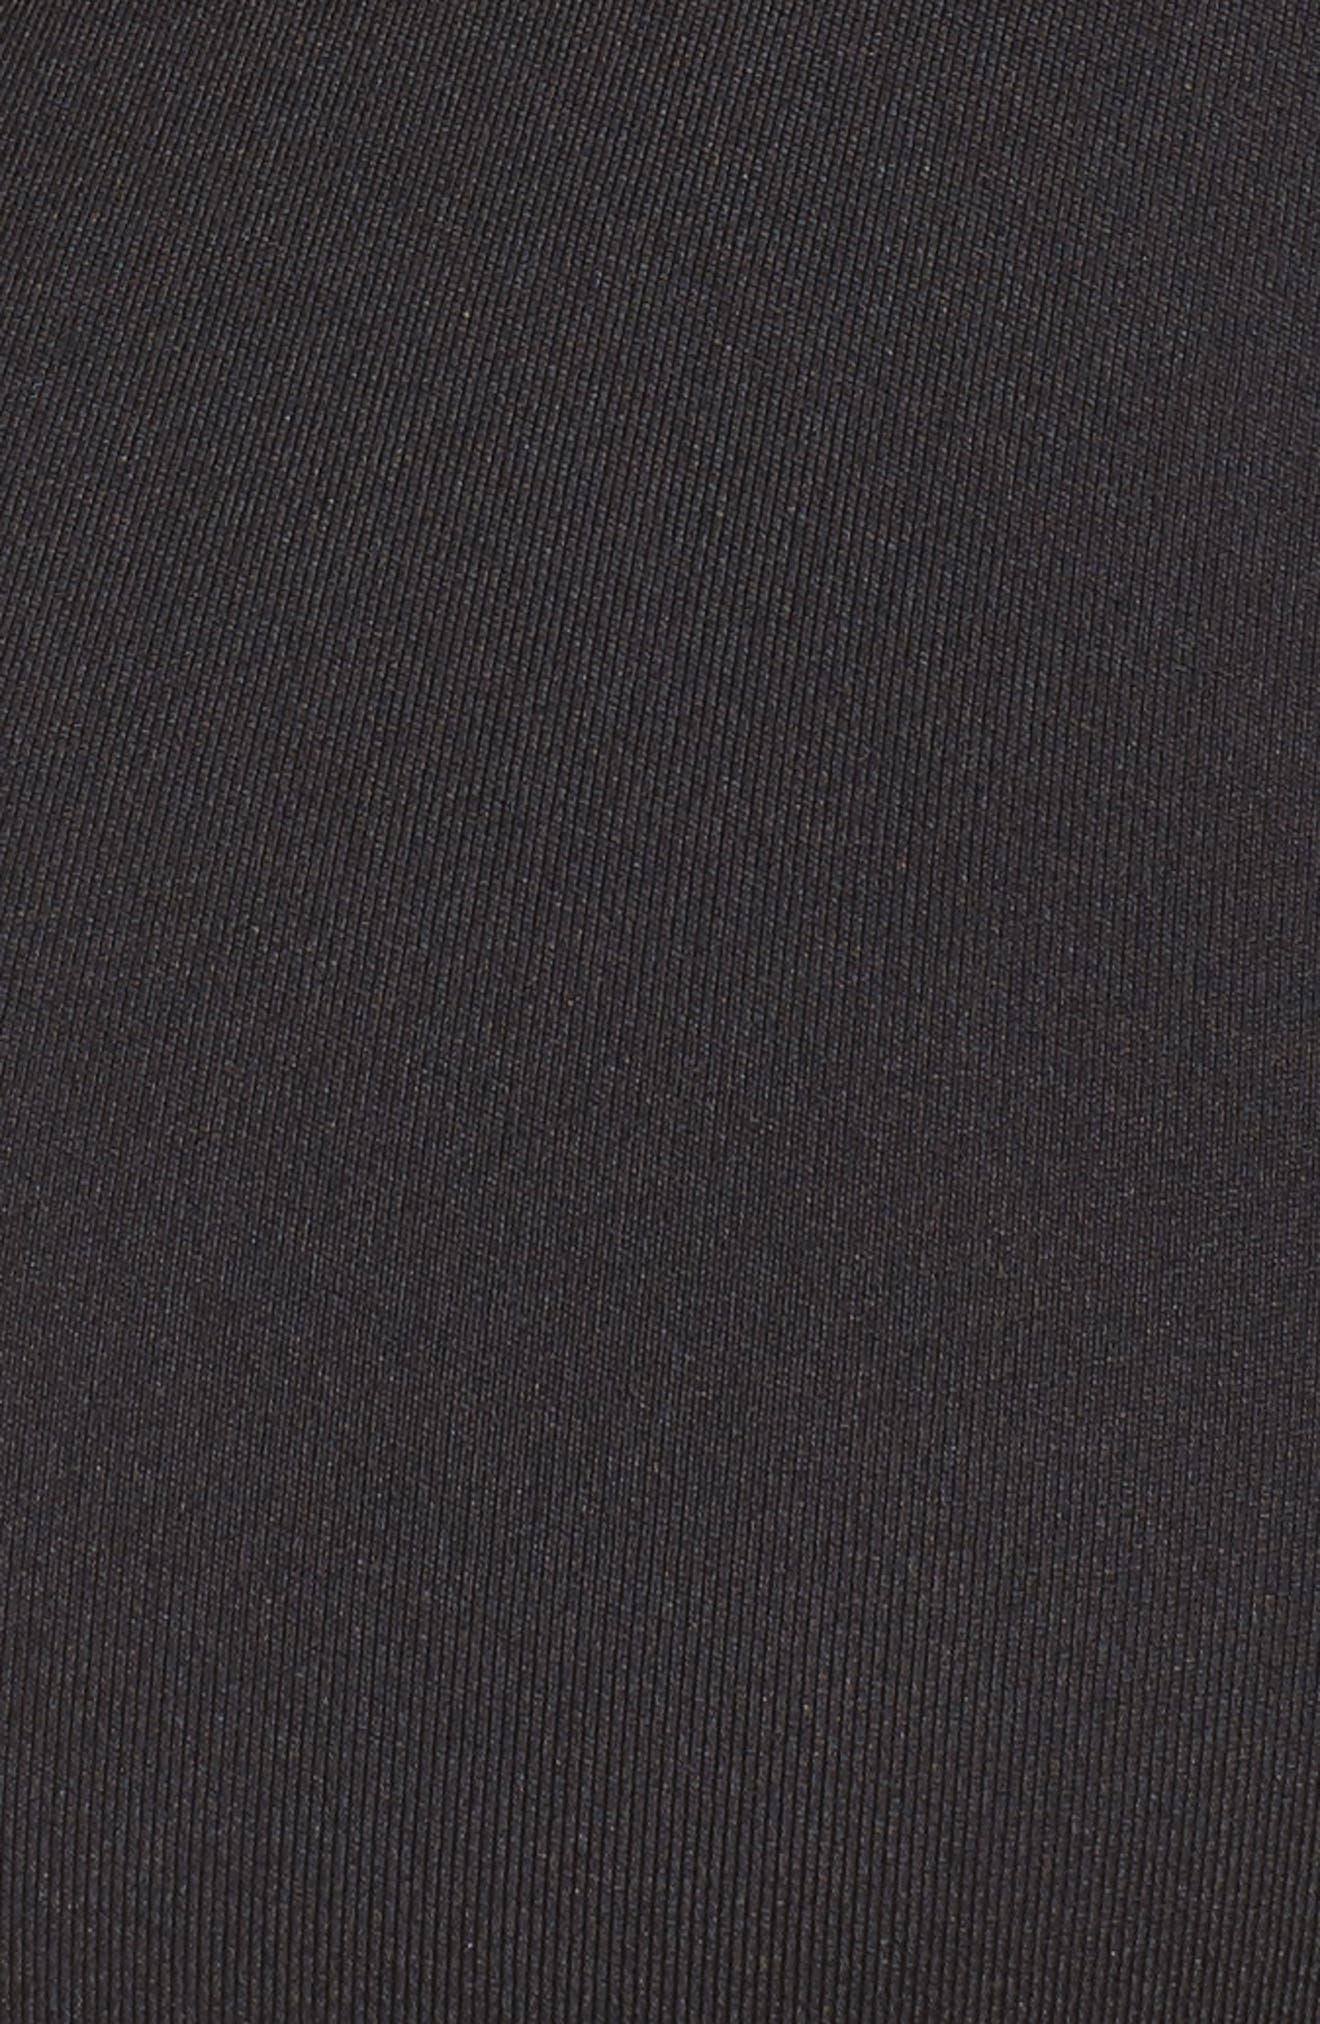 scalloped sports bra,                             Alternate thumbnail 6, color,                             BLACK